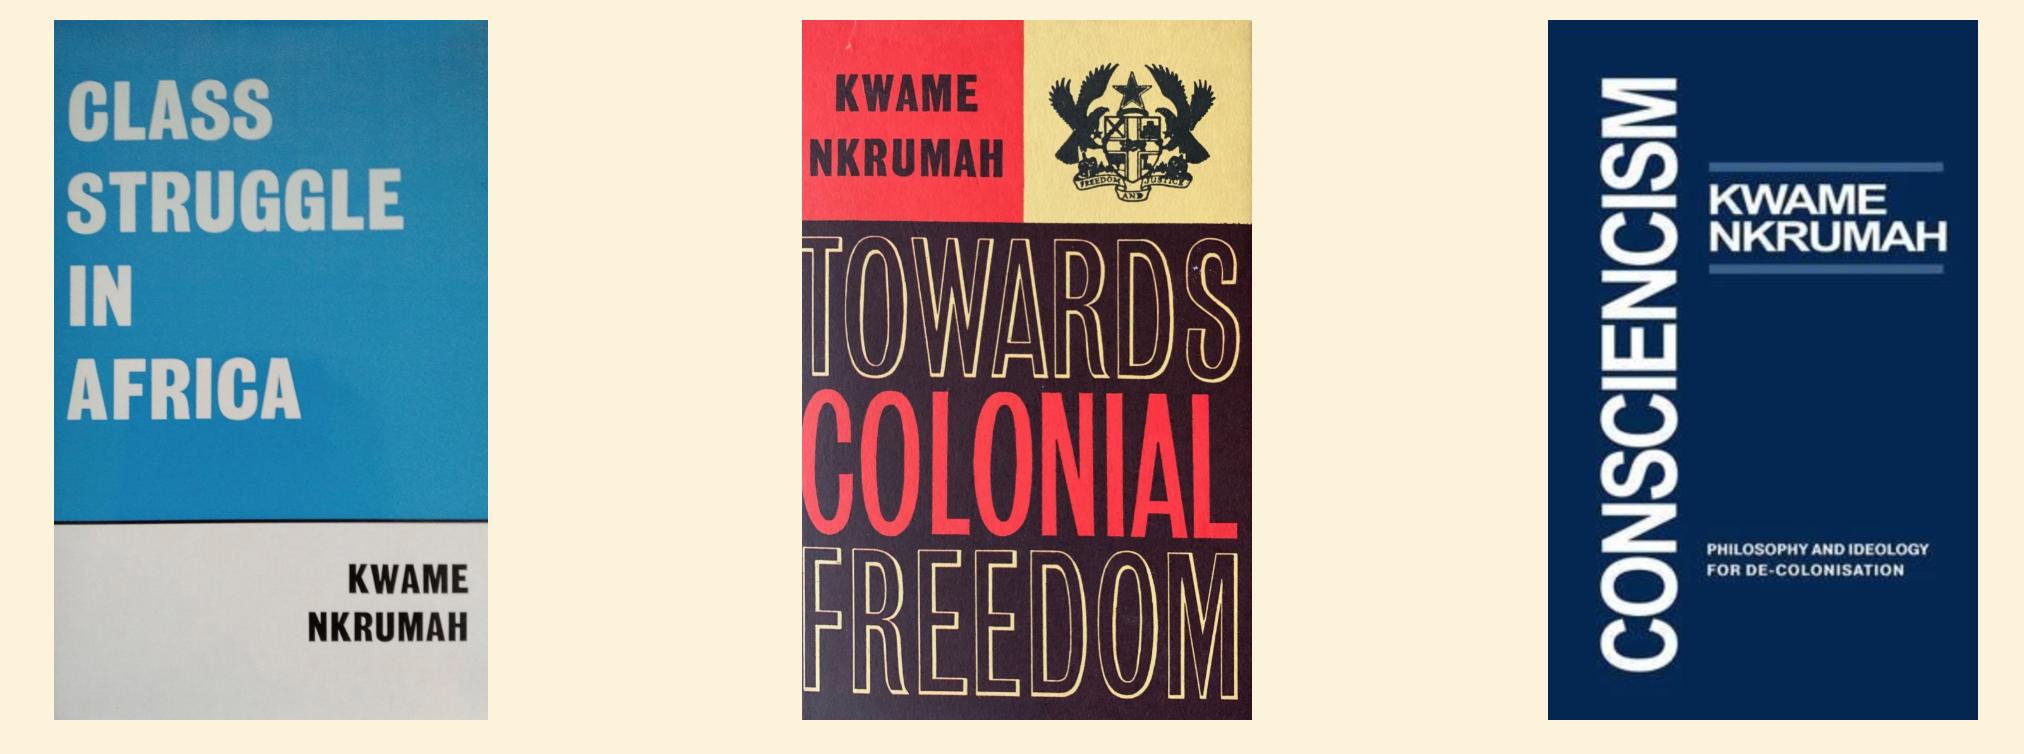 Archiving Kwame Nkrumah work